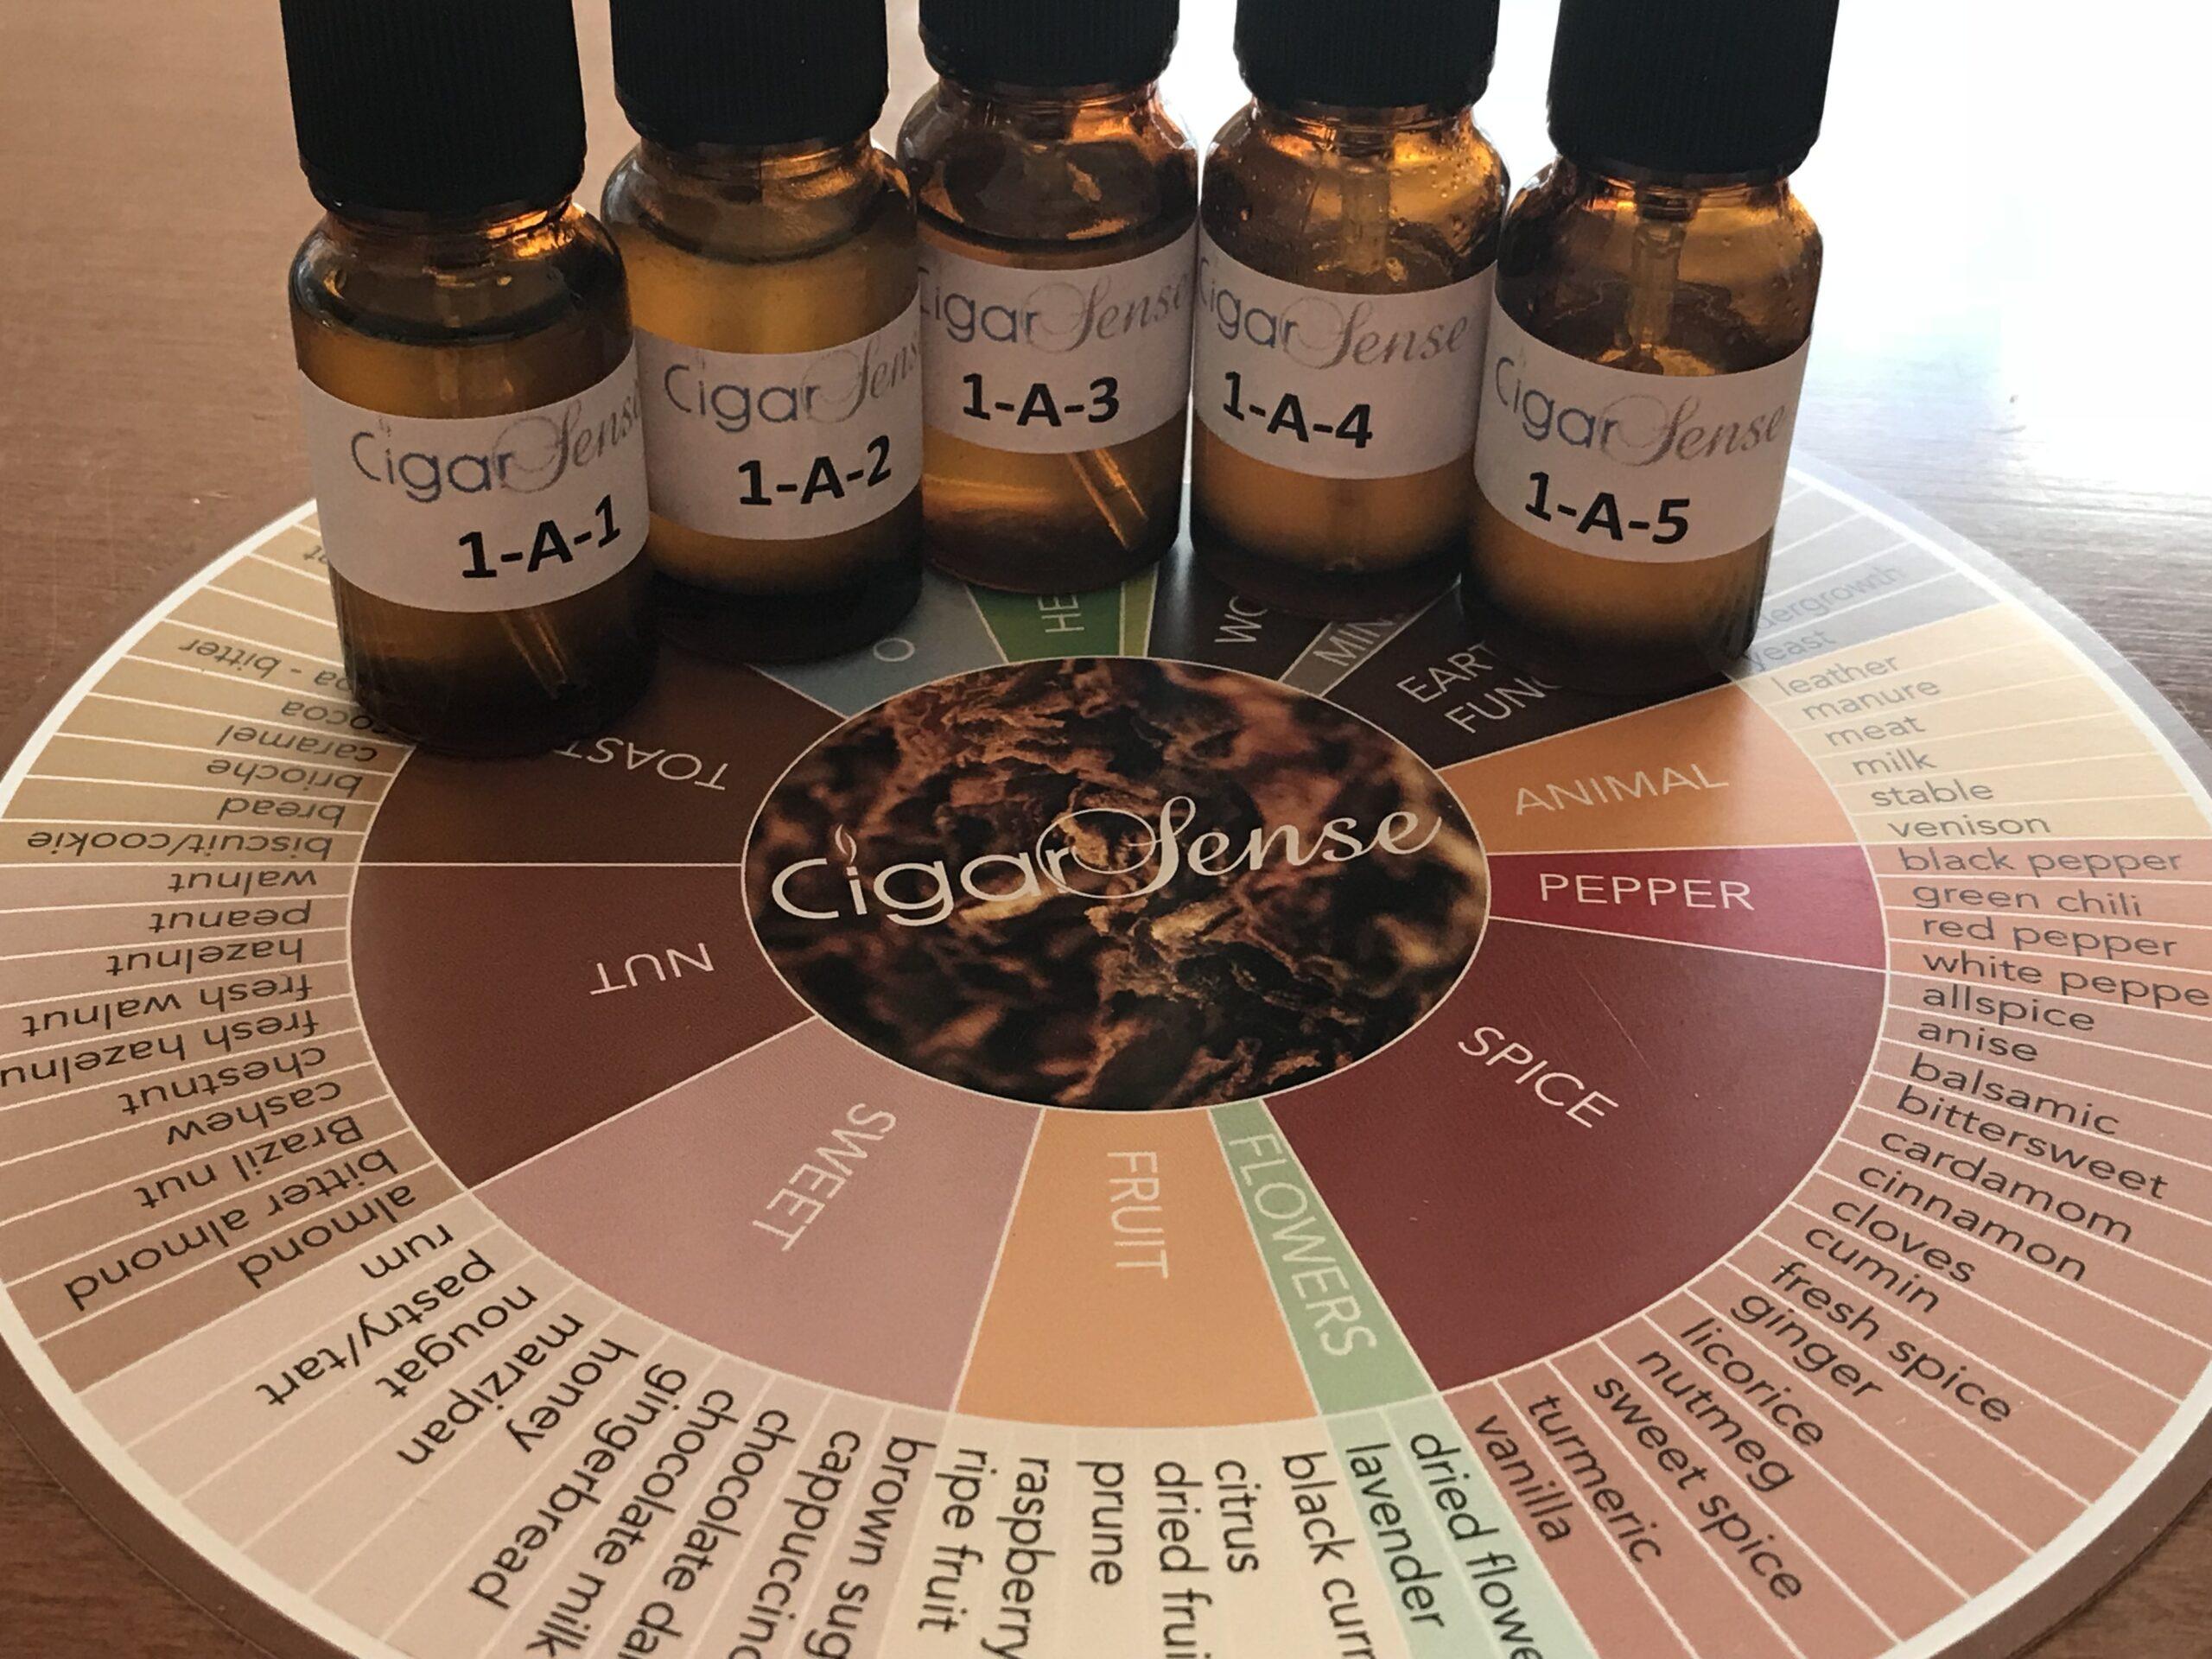 Aroma standards